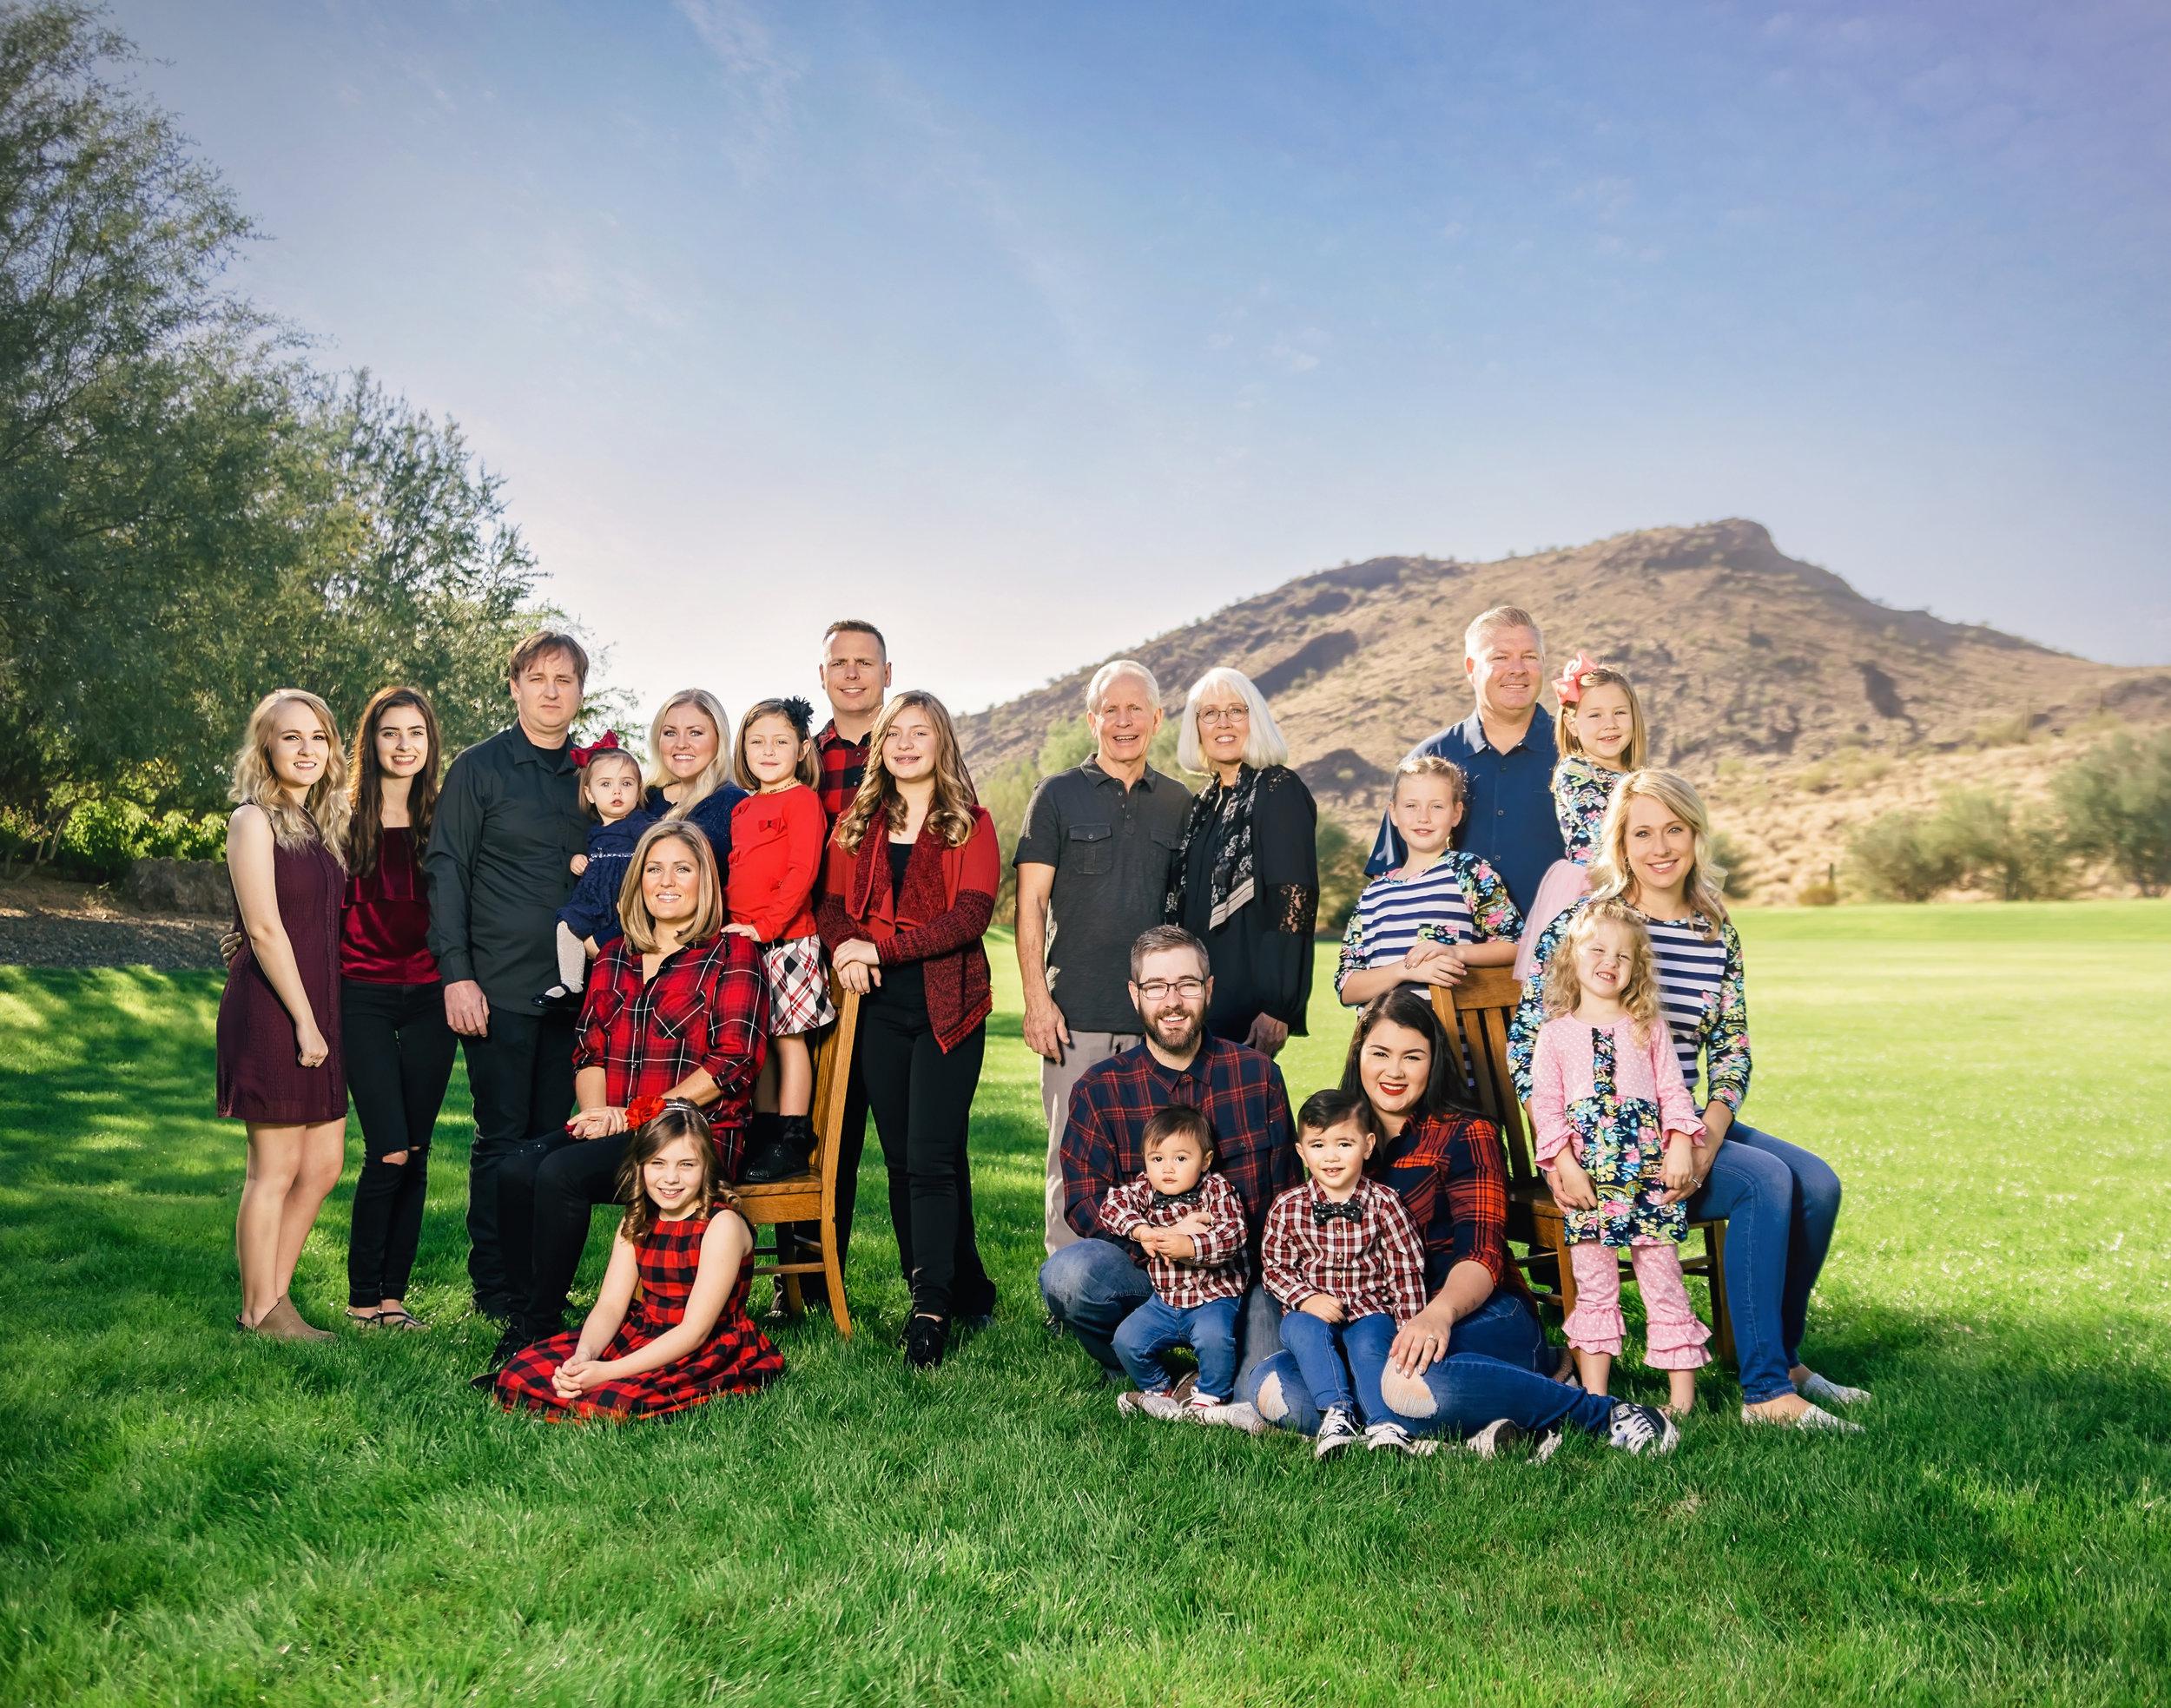 Peoria Glendale Arizona Family pictures Phoenix Photographer Anjeanette Photography Stetson Hills Az